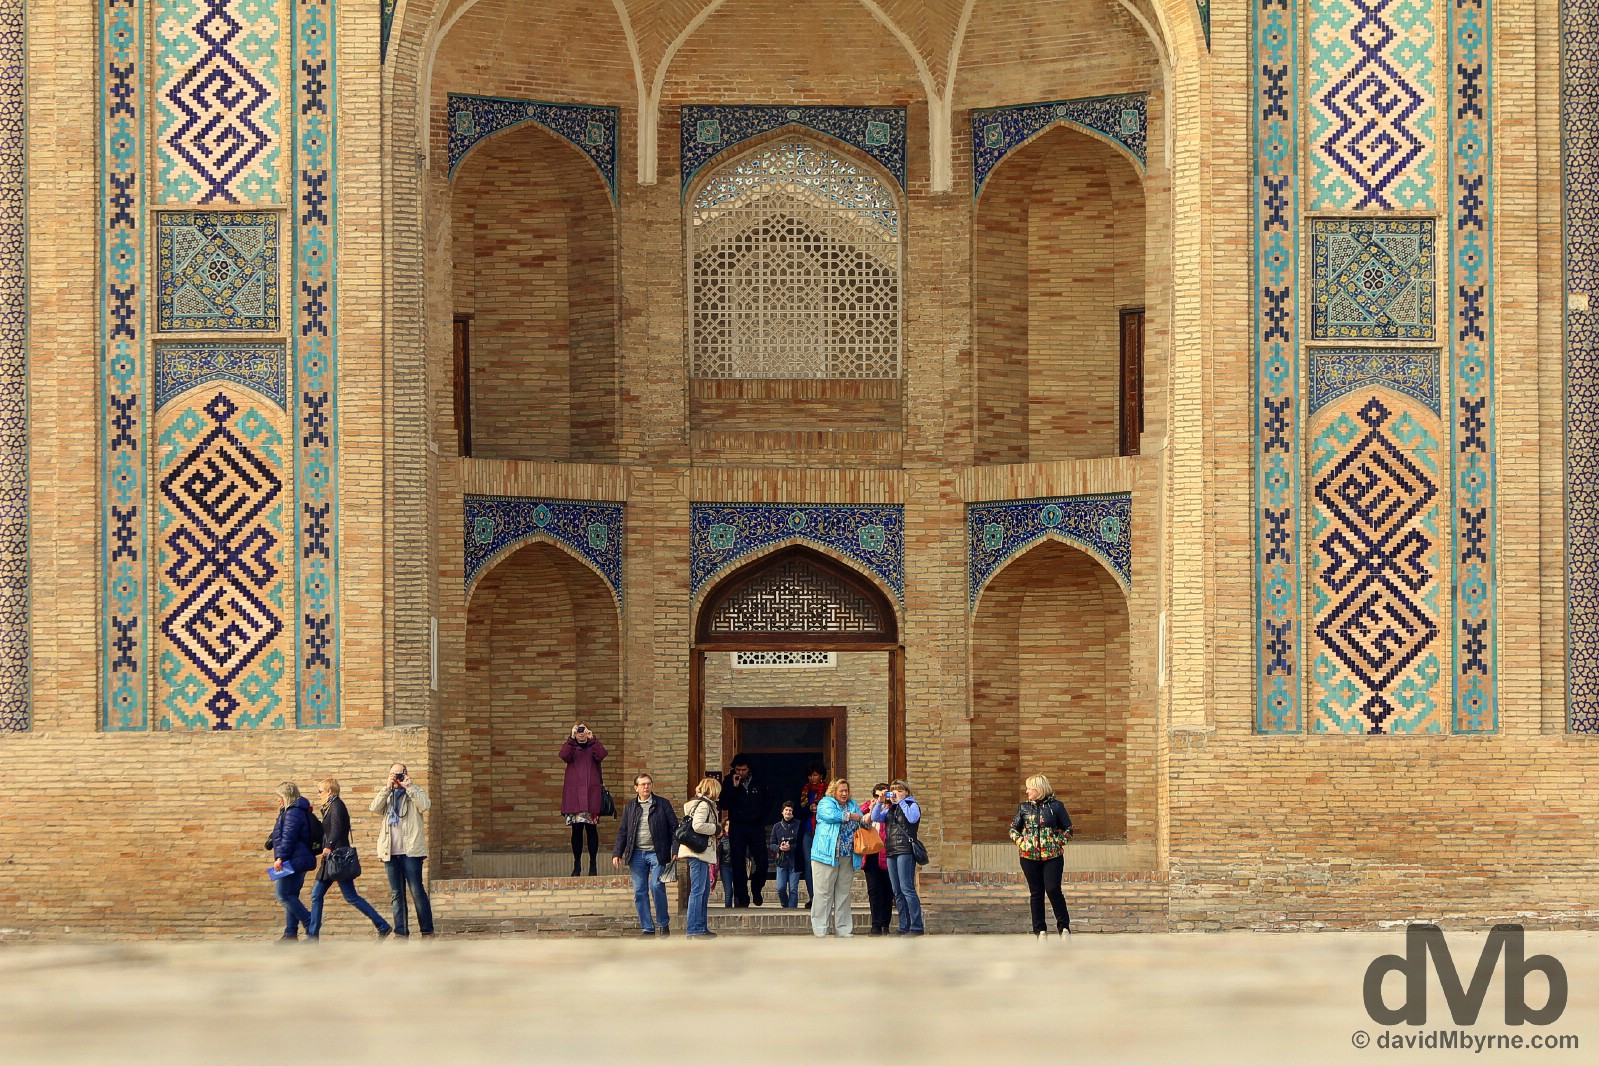 A portion of the facade of Barak Khan Medressa in Khast Imon, Tashkent, Uzbekistan. March 6, 2015.